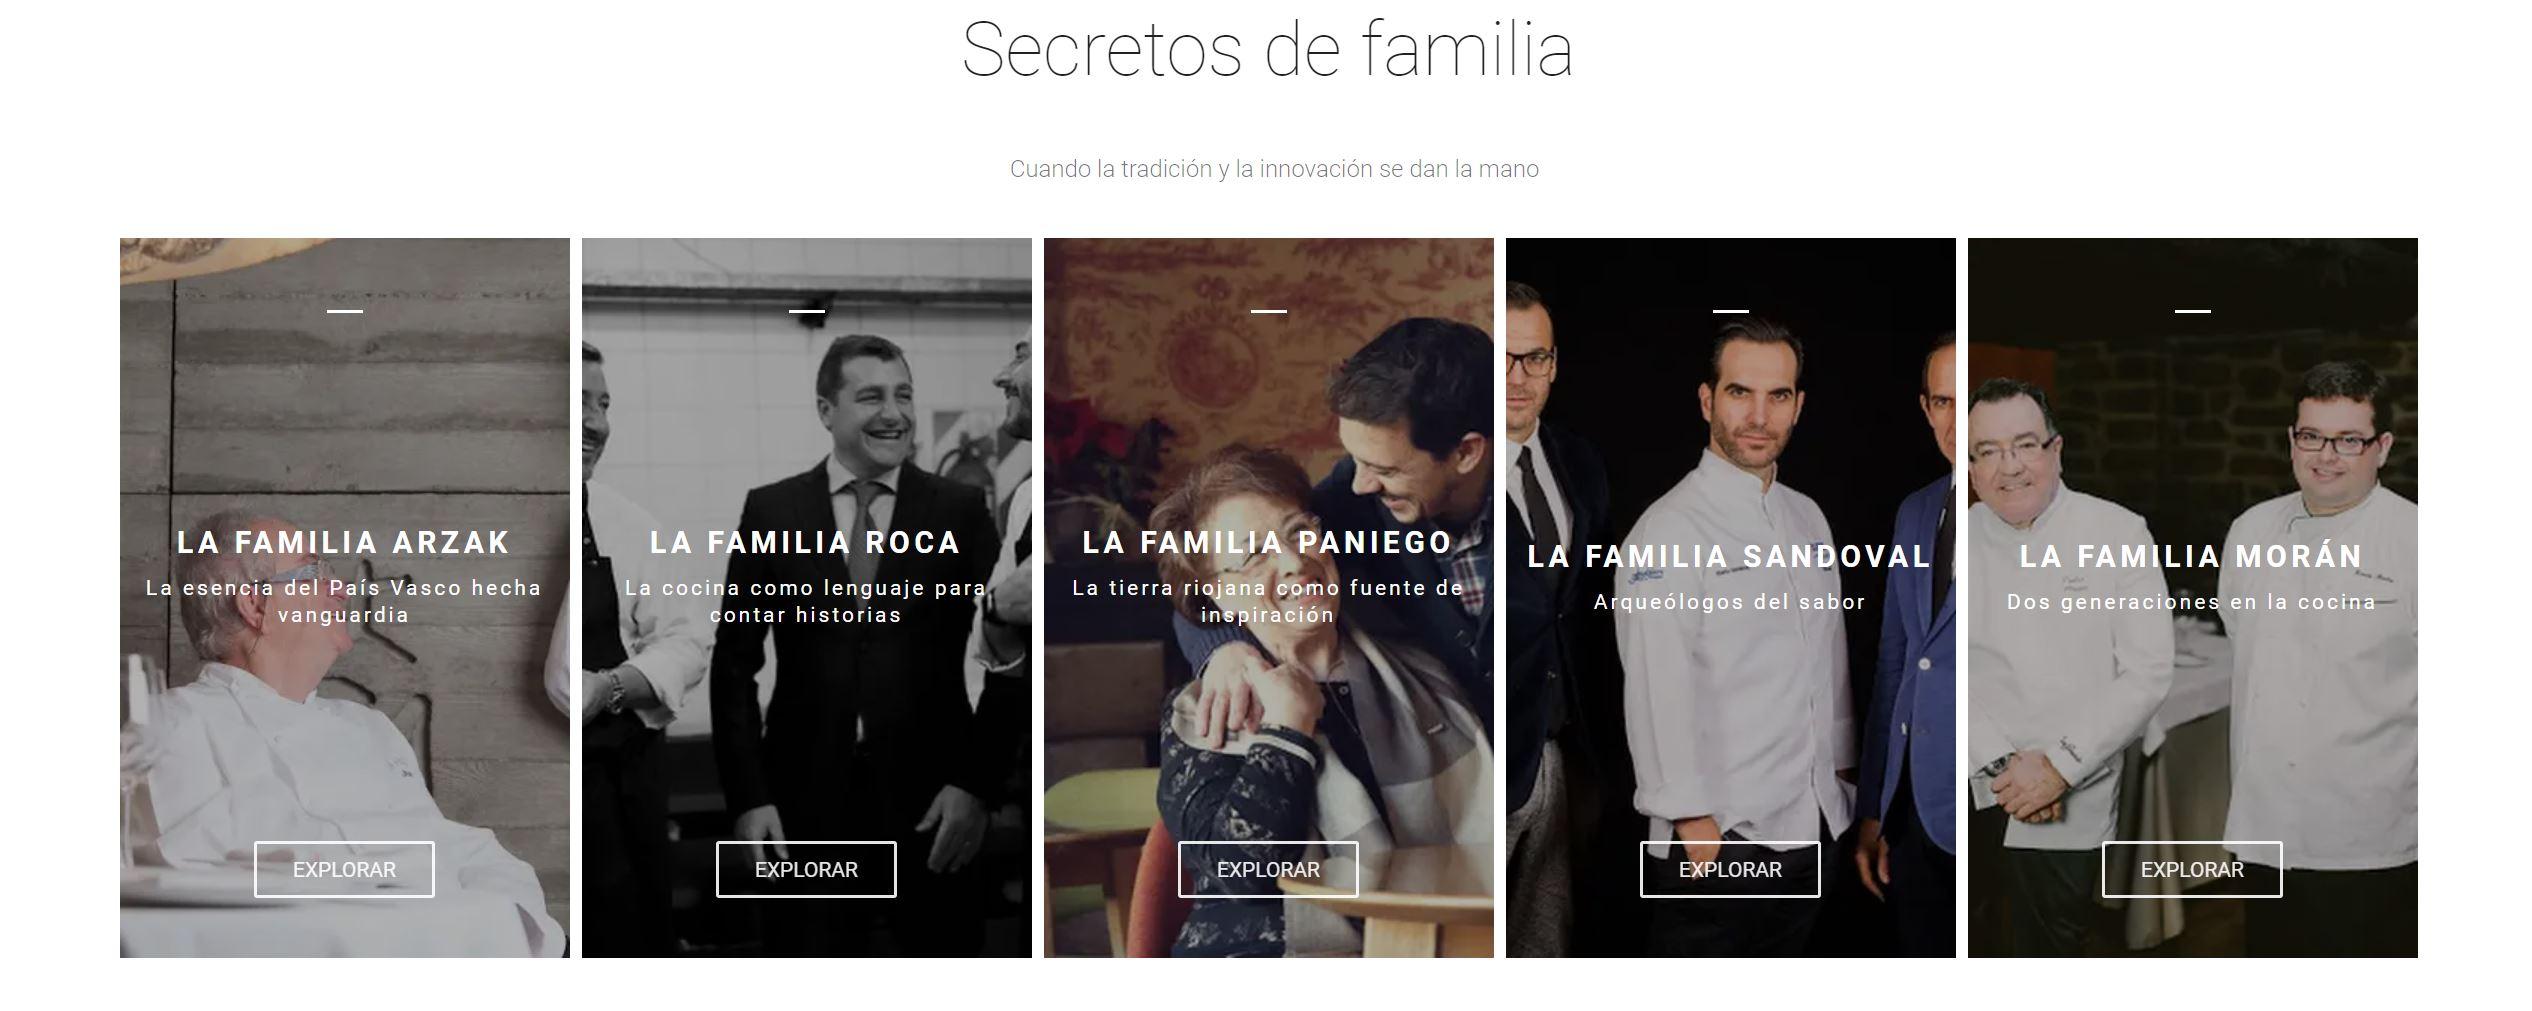 España - cocina abierta - Secretos de familia